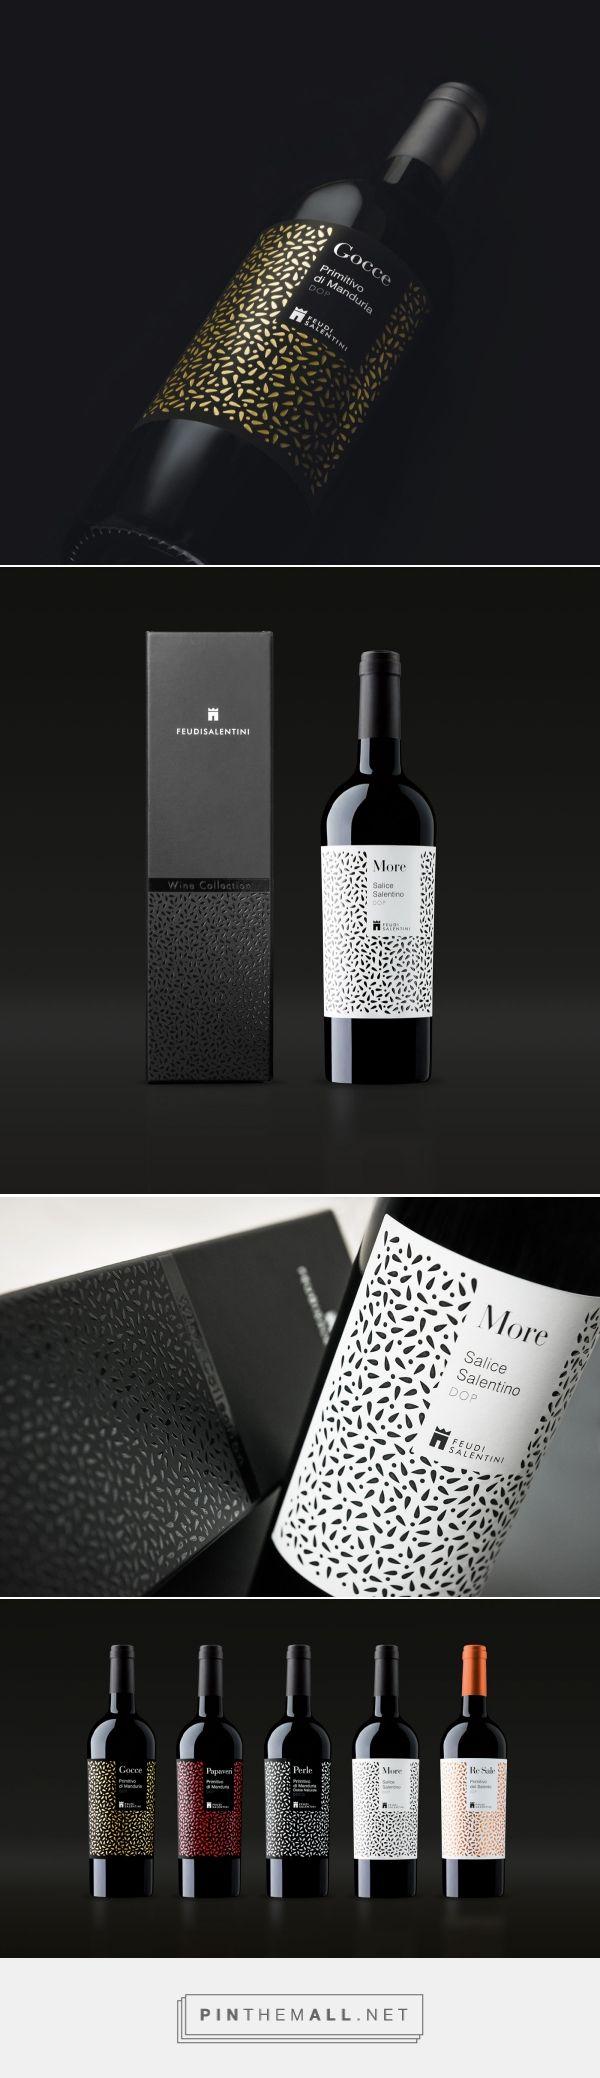 Etichette e packaging vini Feudi Salentini - created via http://pinthemall.net